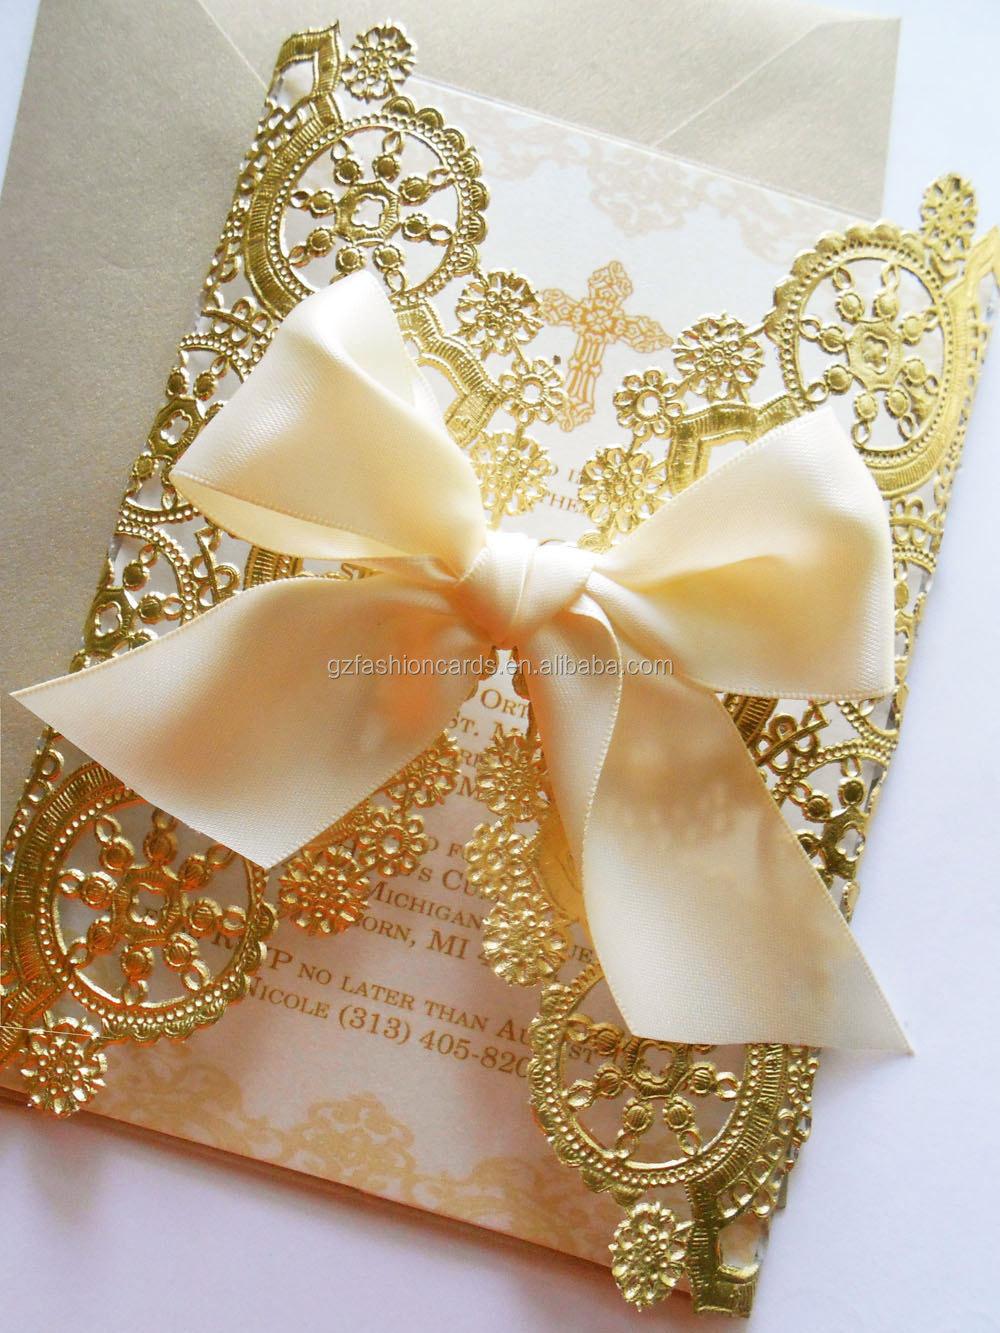 Laser Cut Wedding Invitation Cards